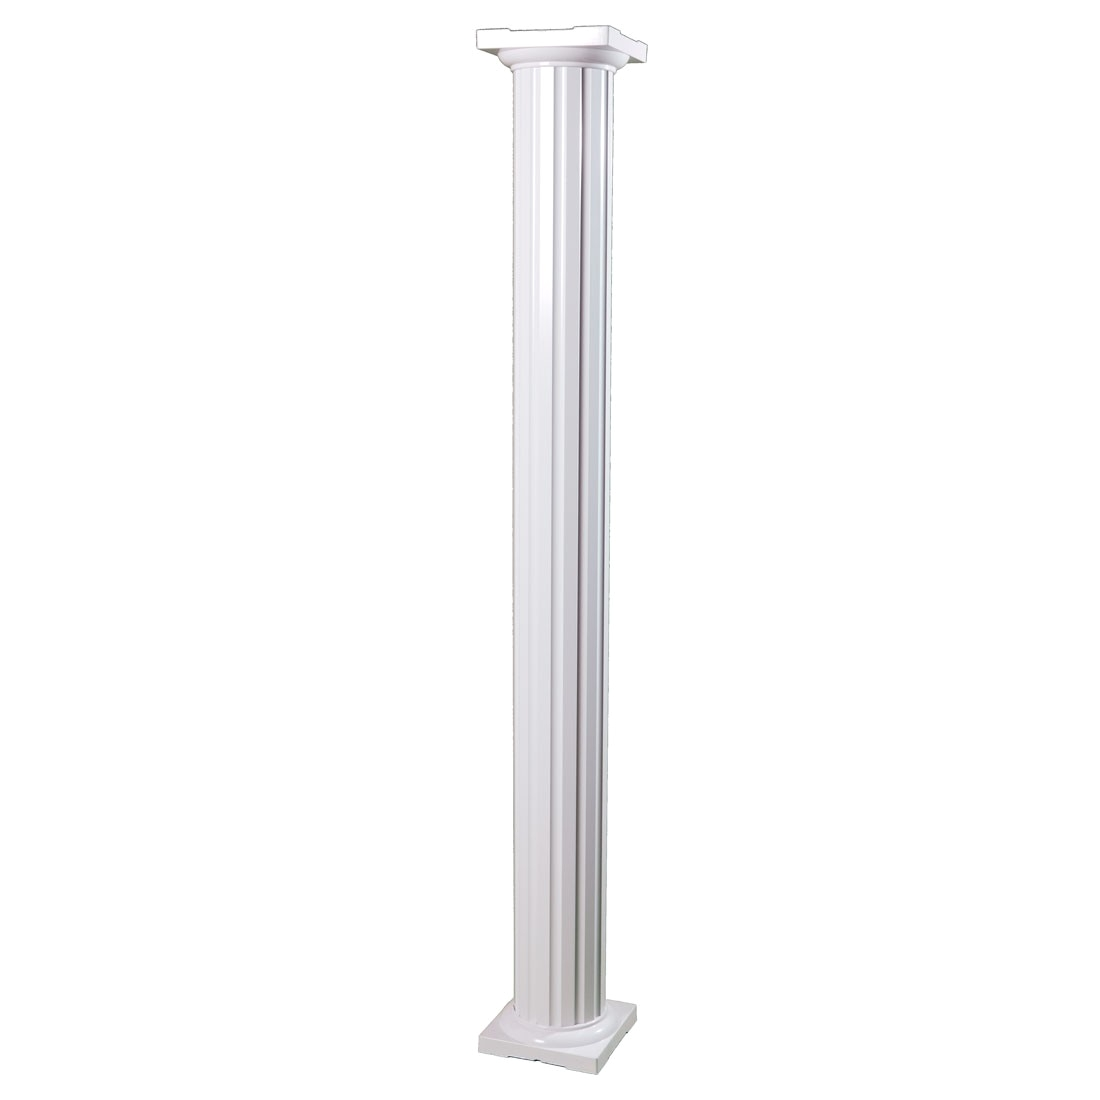 Interior Round Column Wraps Buy Round Fluted Aluminum Columns Support Columns Wraps